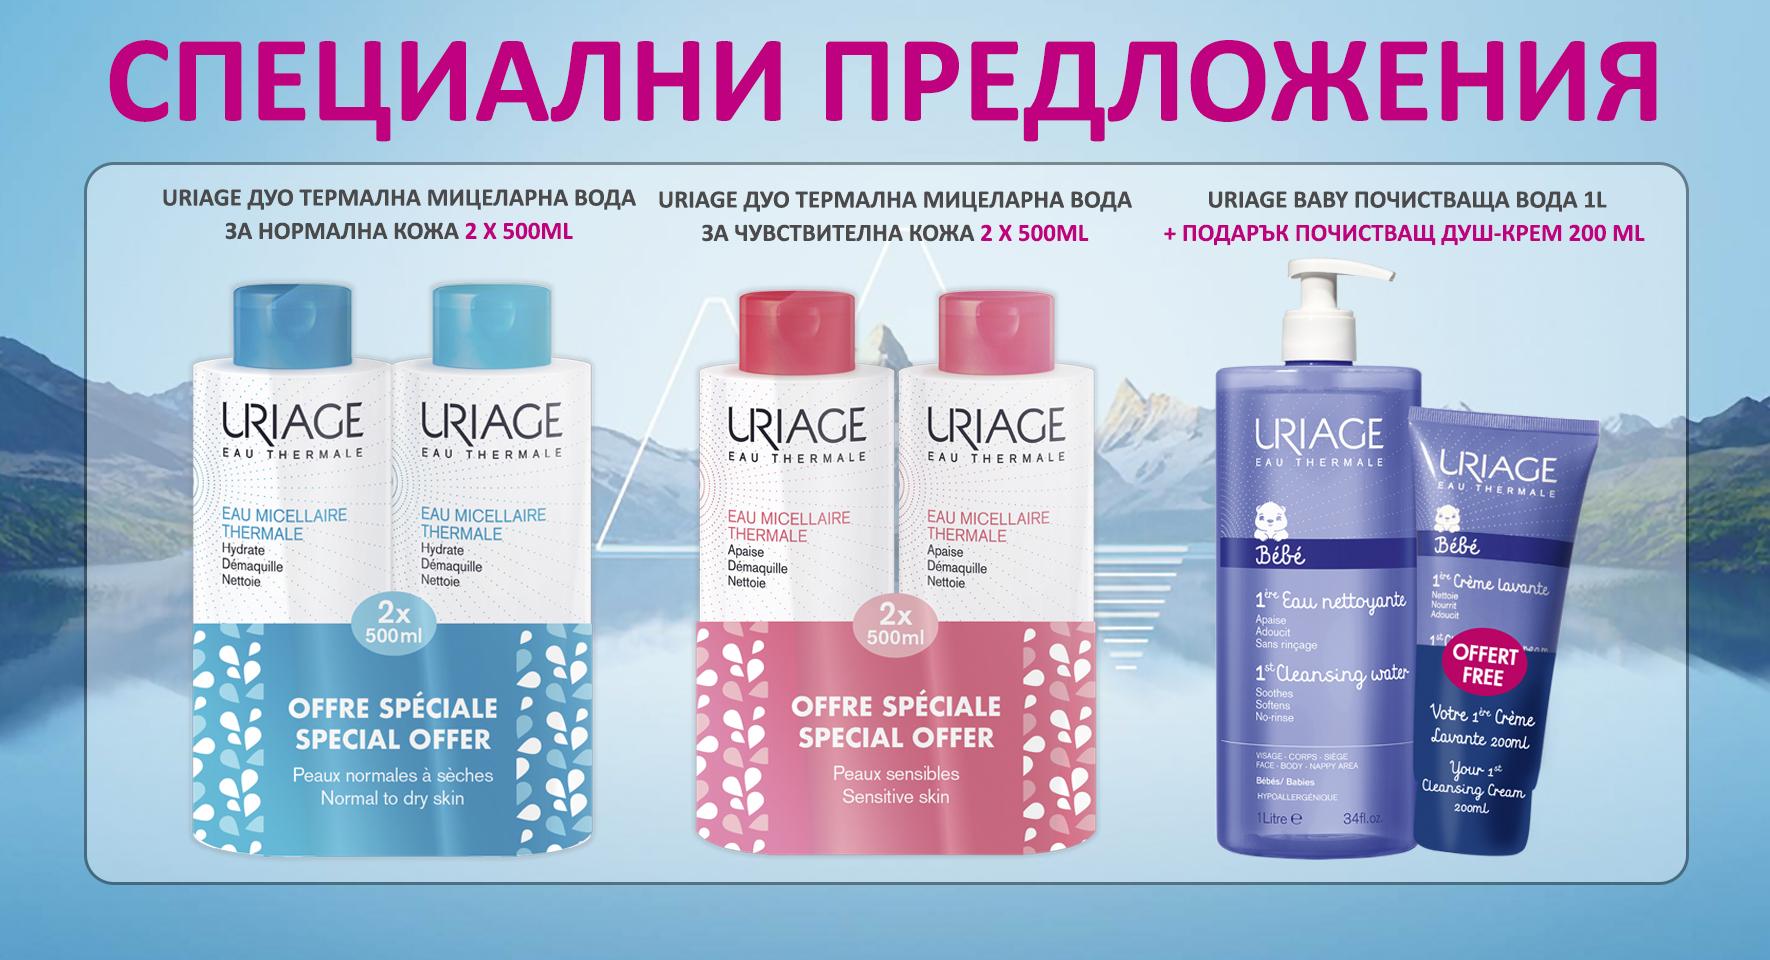 uriage_05